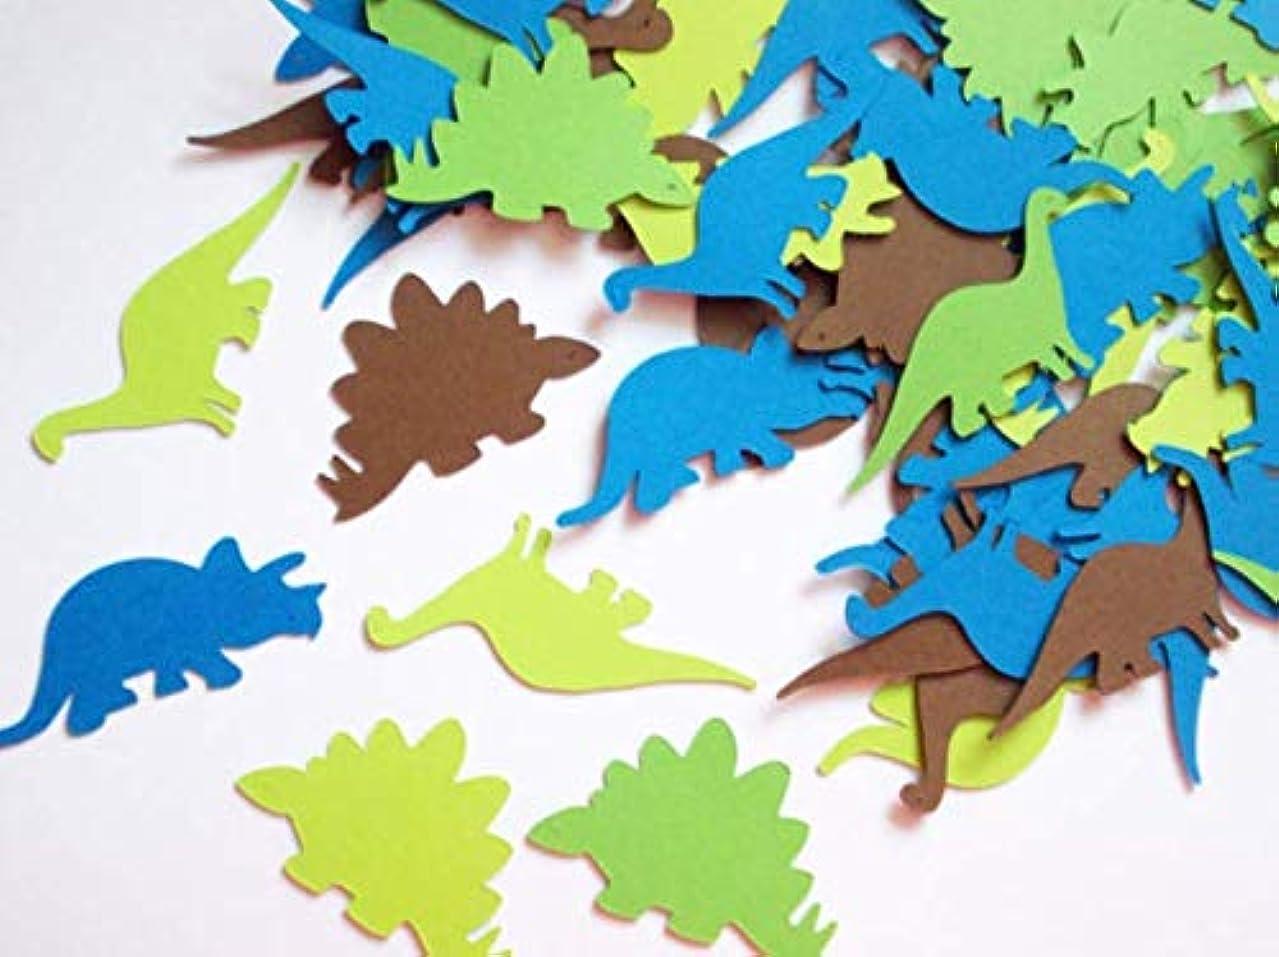 Astra Gourmet Dinosaur Paper Confetti Dino Theme Shape Cutouts Confetti for Wedding Baby Shower Birthday Table Confetti Party Supplies (100pcs)